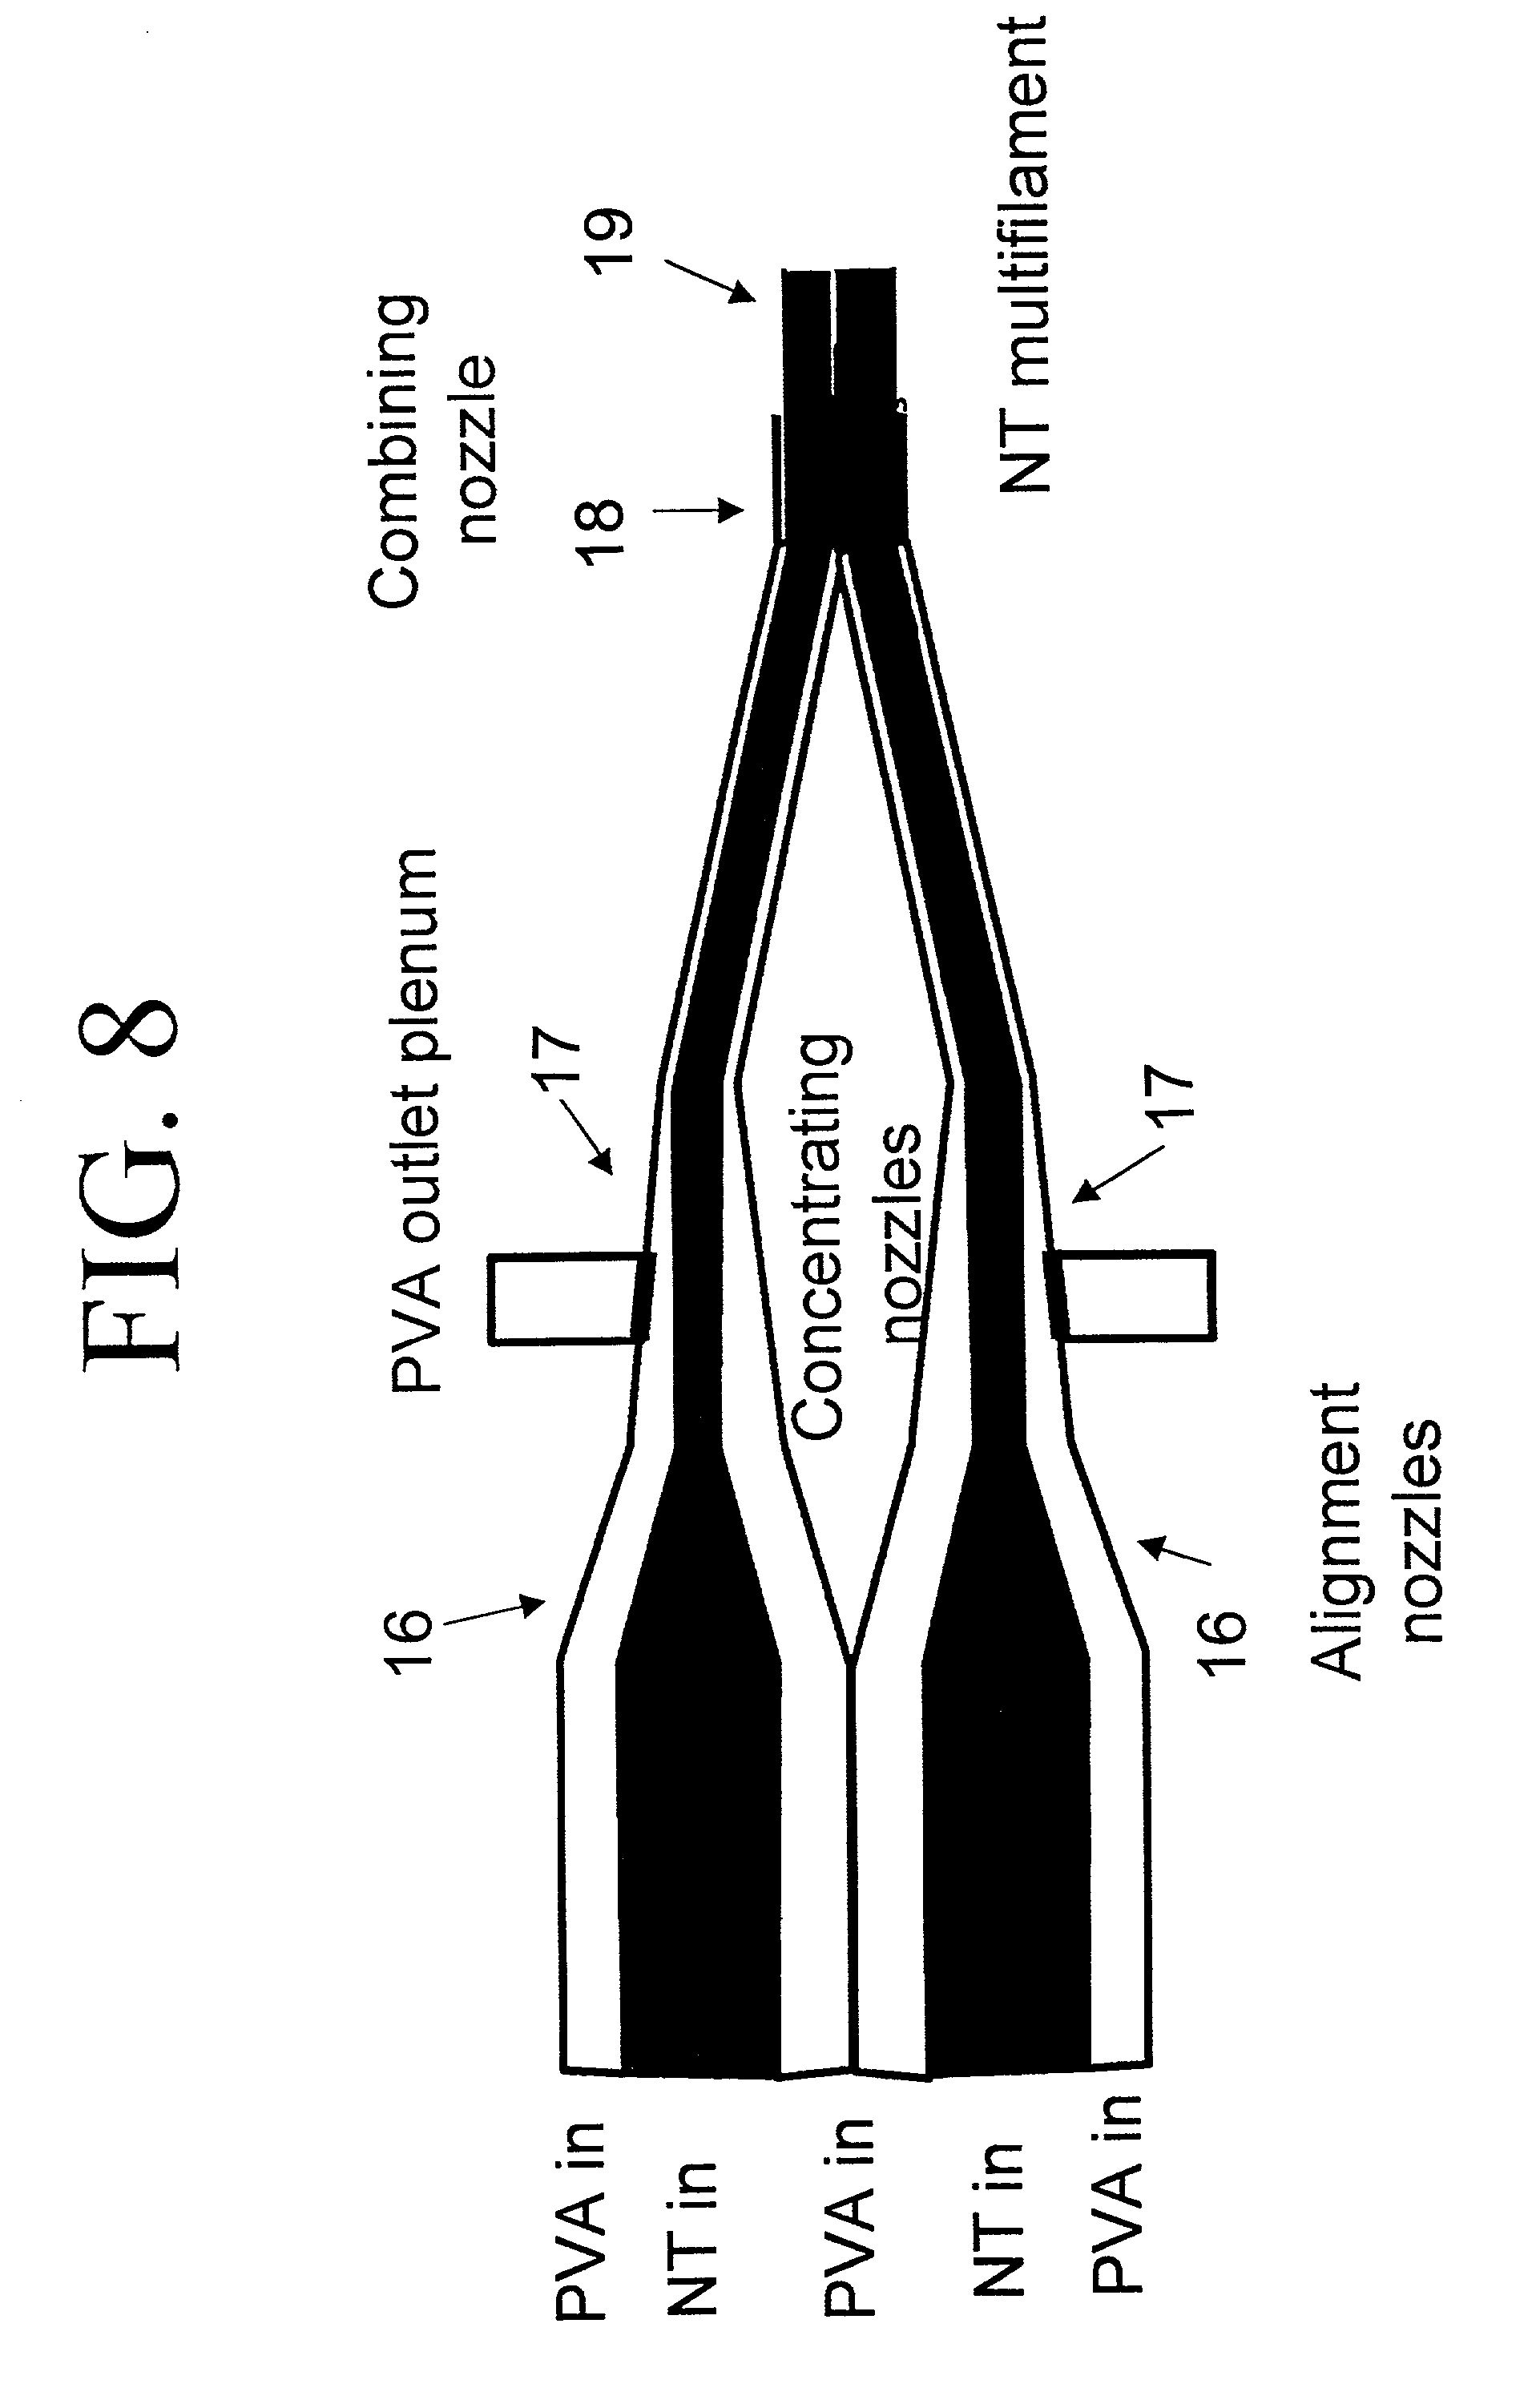 mechanical properties of carbon nanotubes thesis Mechanical and electrical properties of graphene sheets joseph scott bunch, ph d cornell university 2008 this thesis examines the.